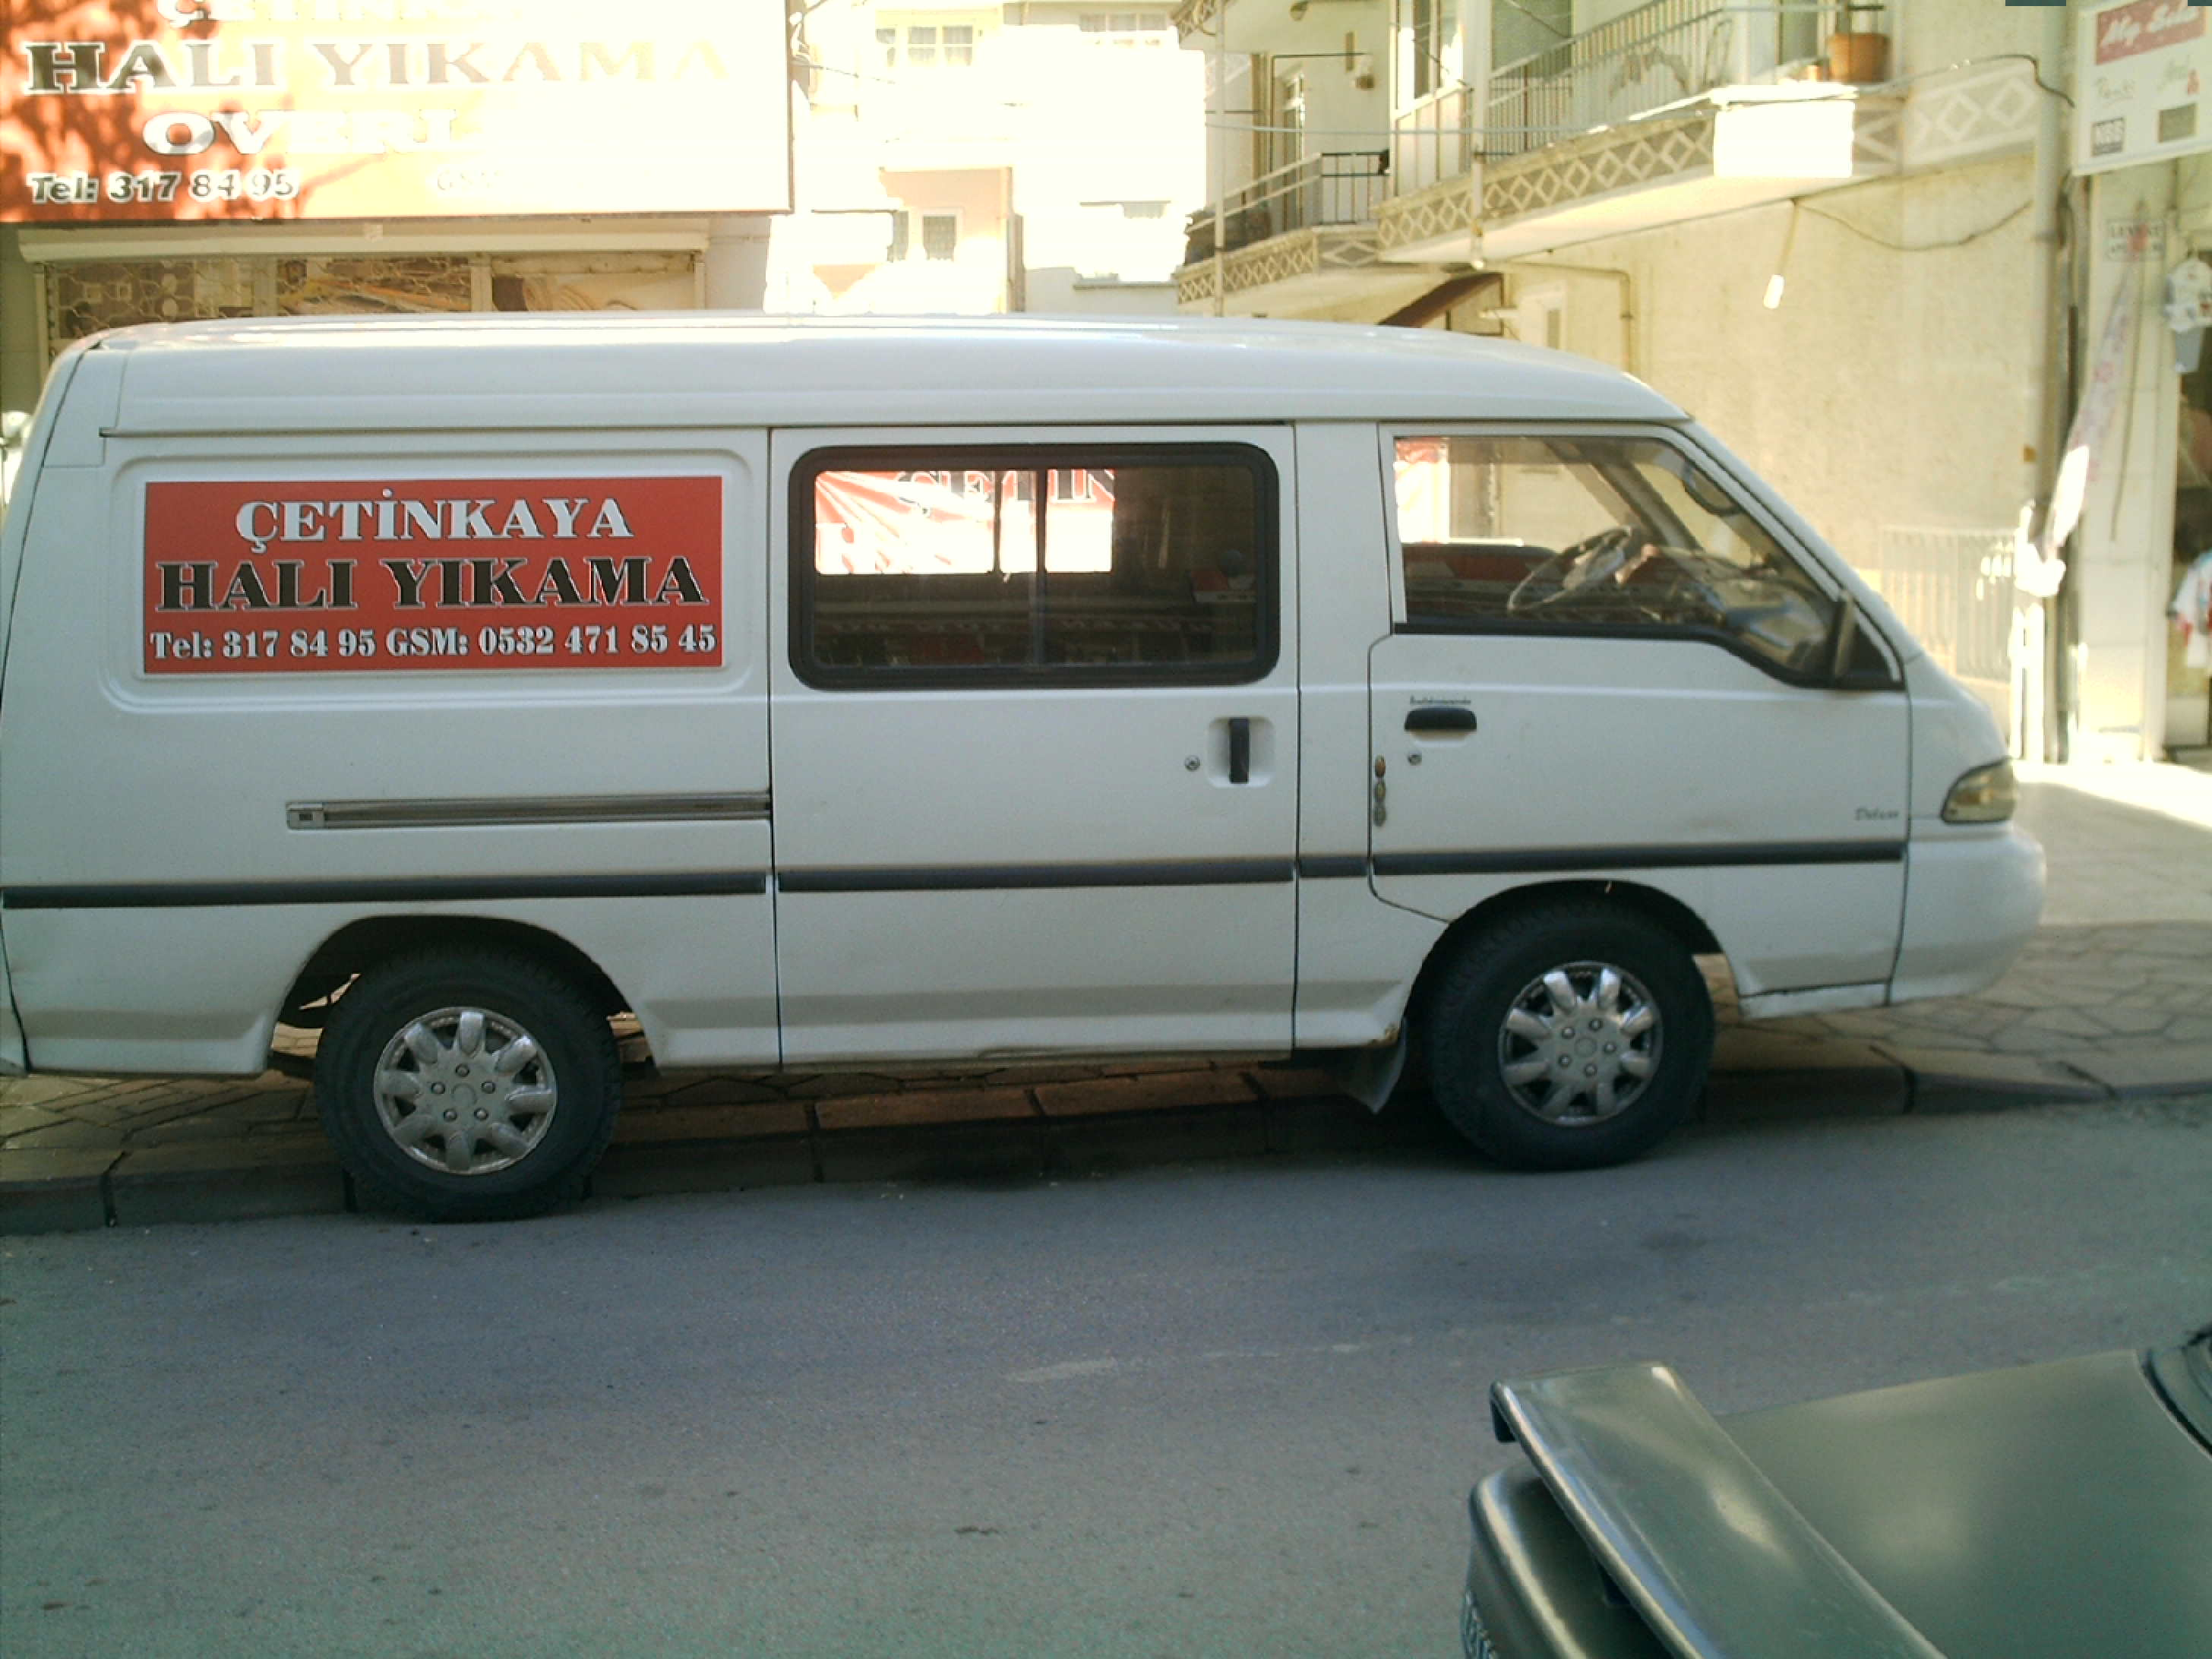 bilkent_hali_yikama_servis_araci